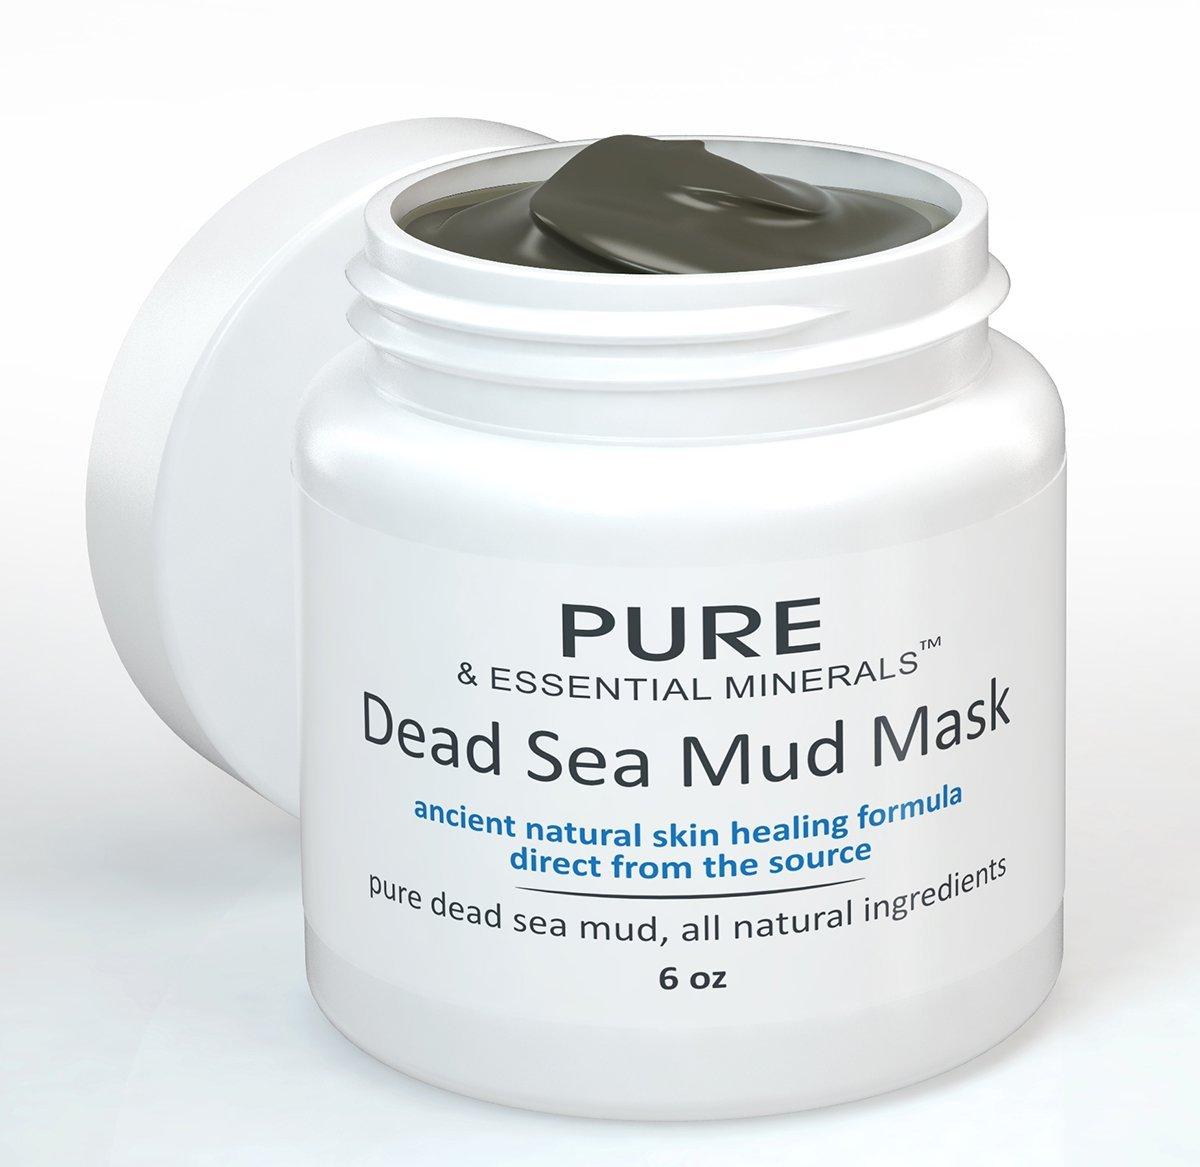 pure & essential minerals dead sea mud mask